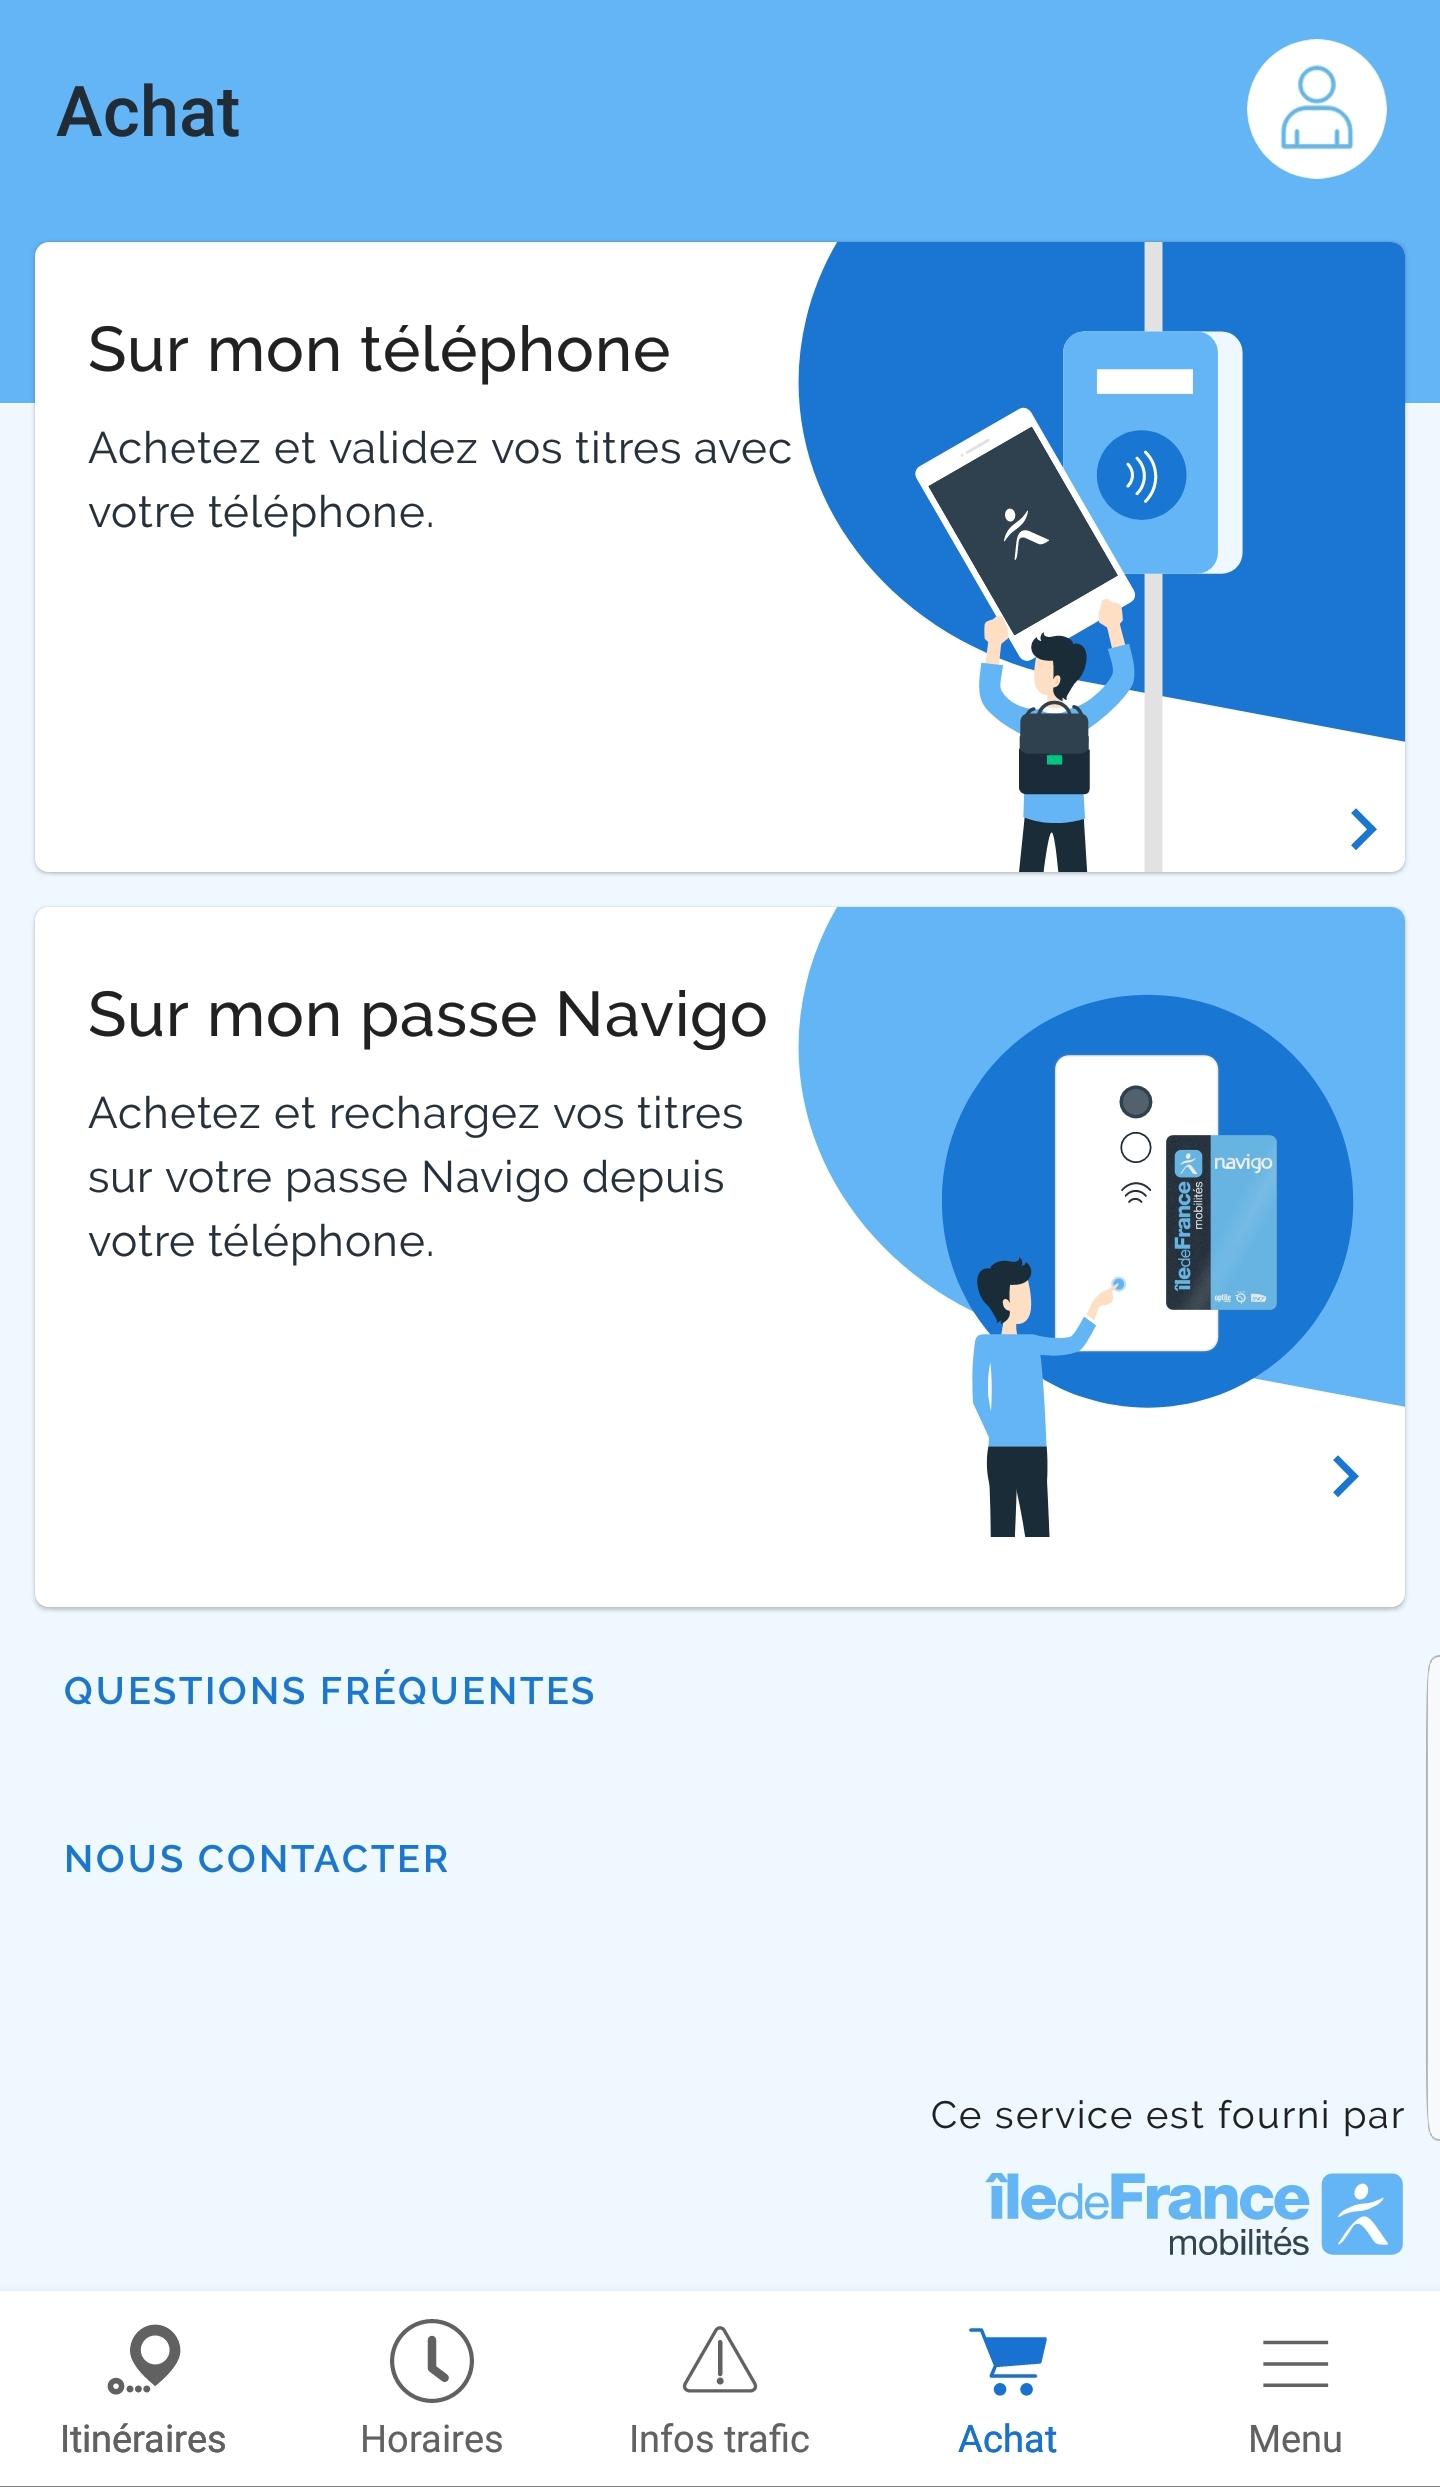 IDF Mobilités Rechargement Navigo Android